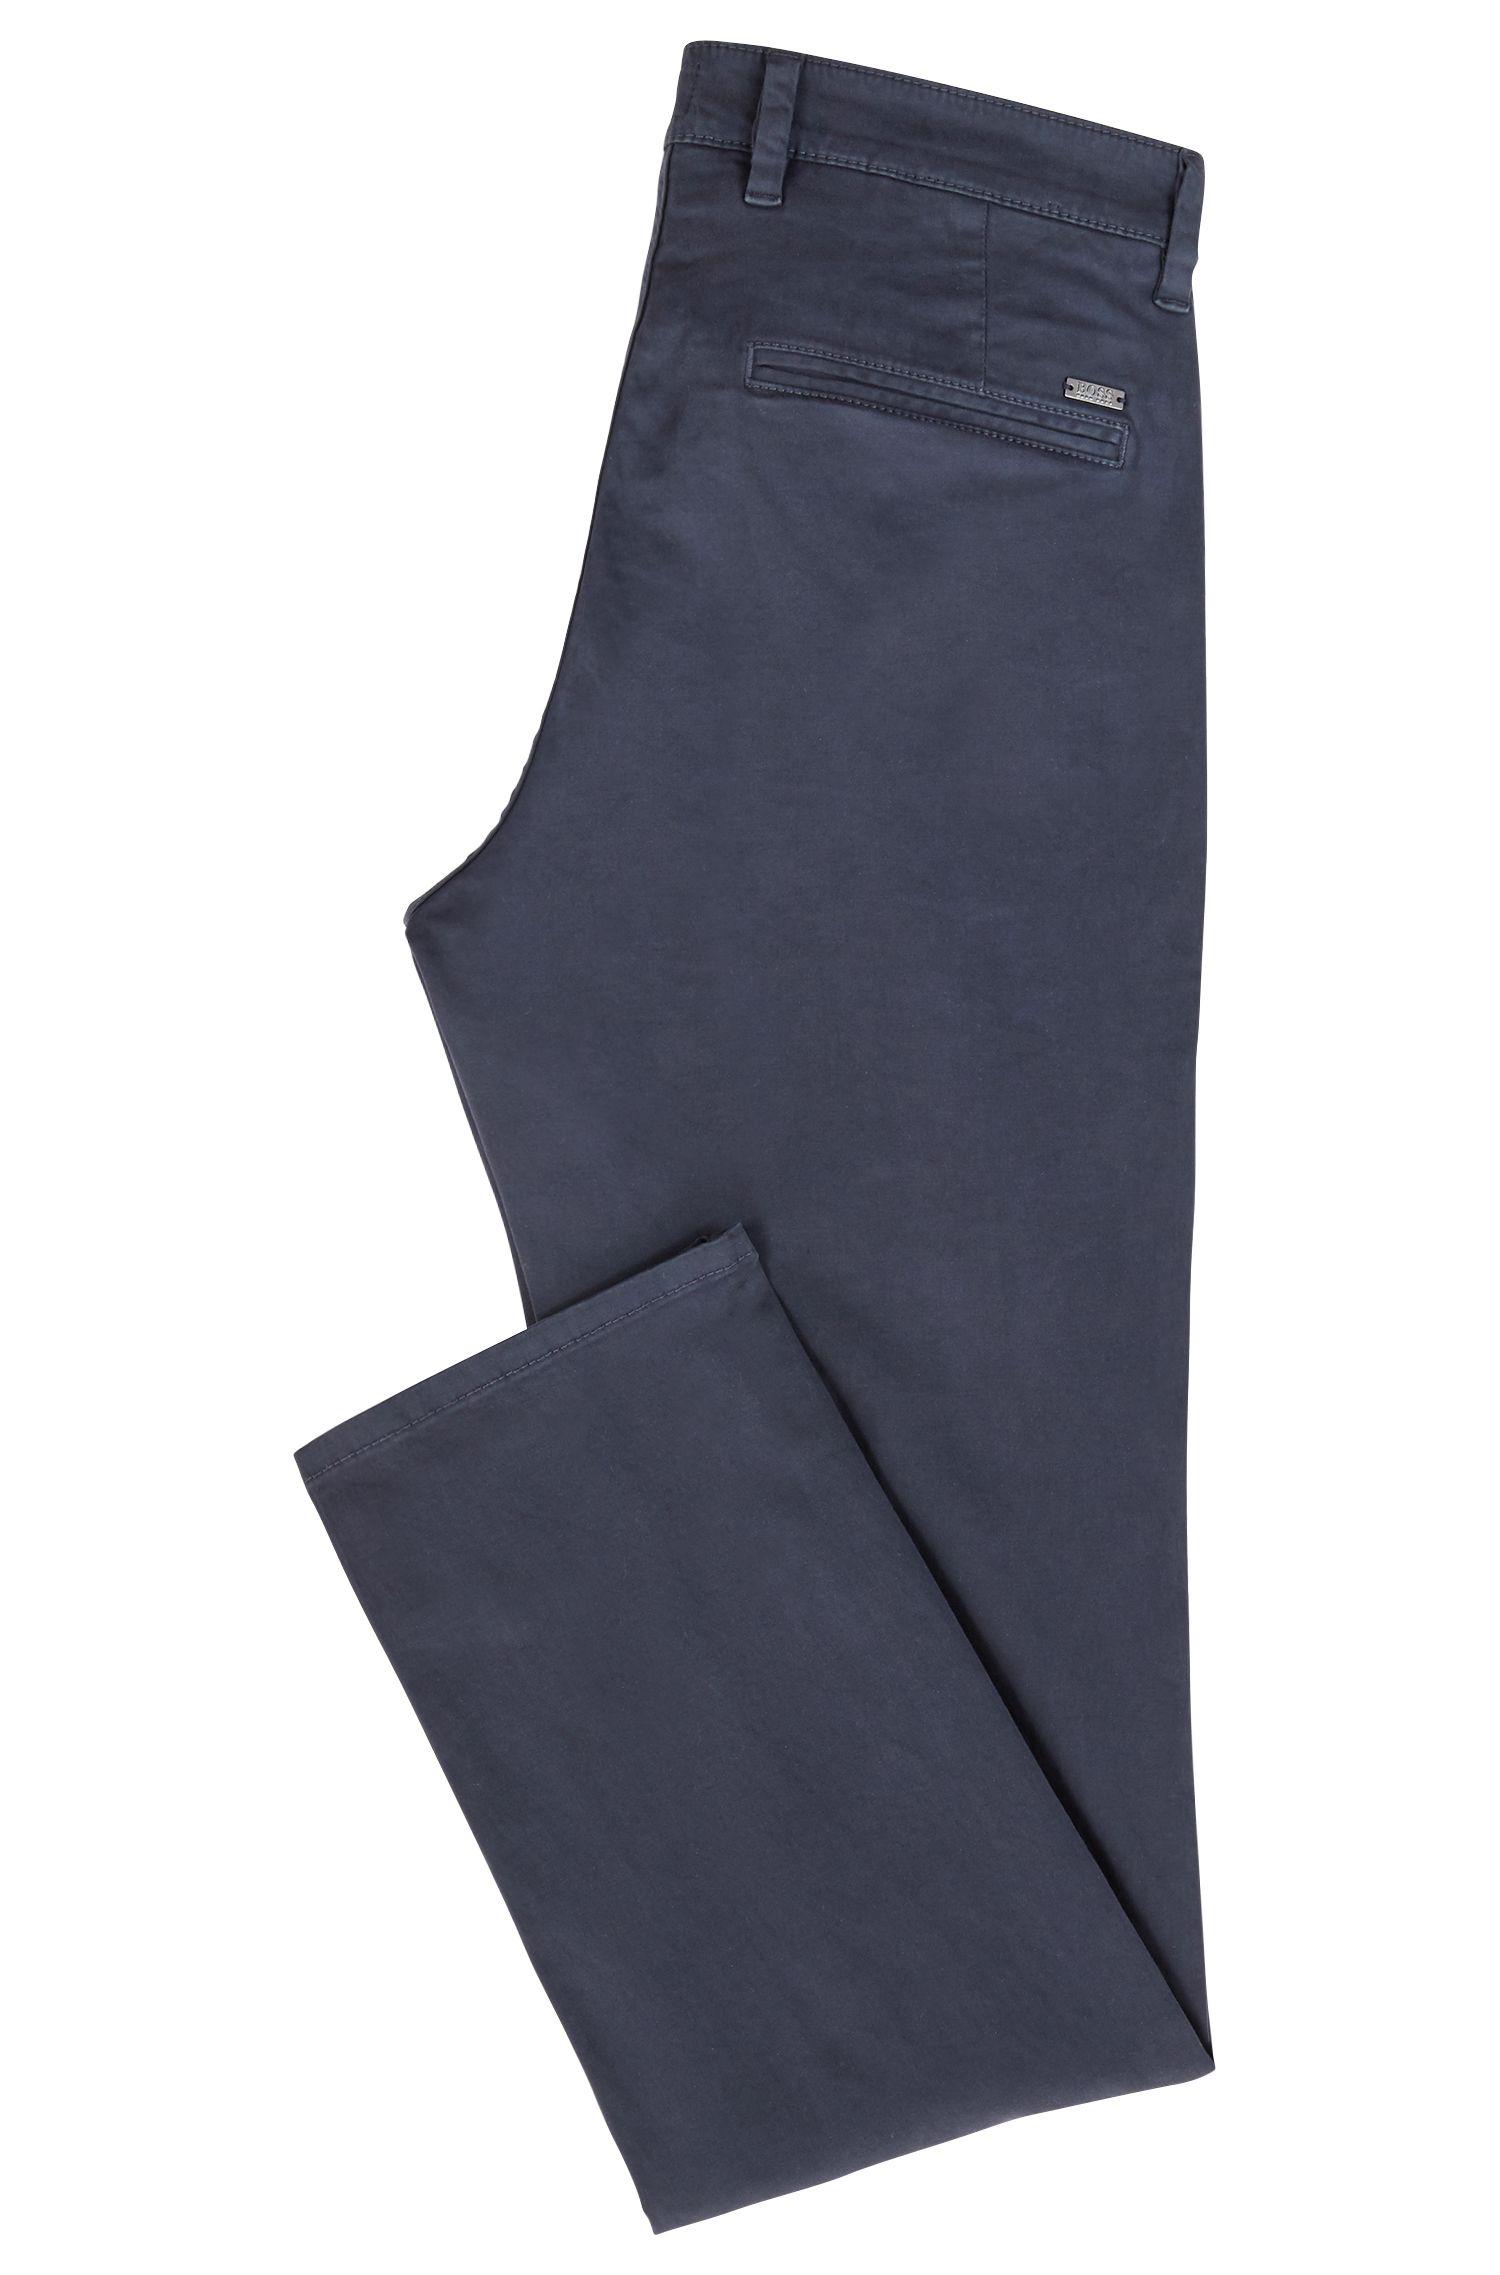 Chino casual Slim Fit en coton stretch brossé, Bleu foncé